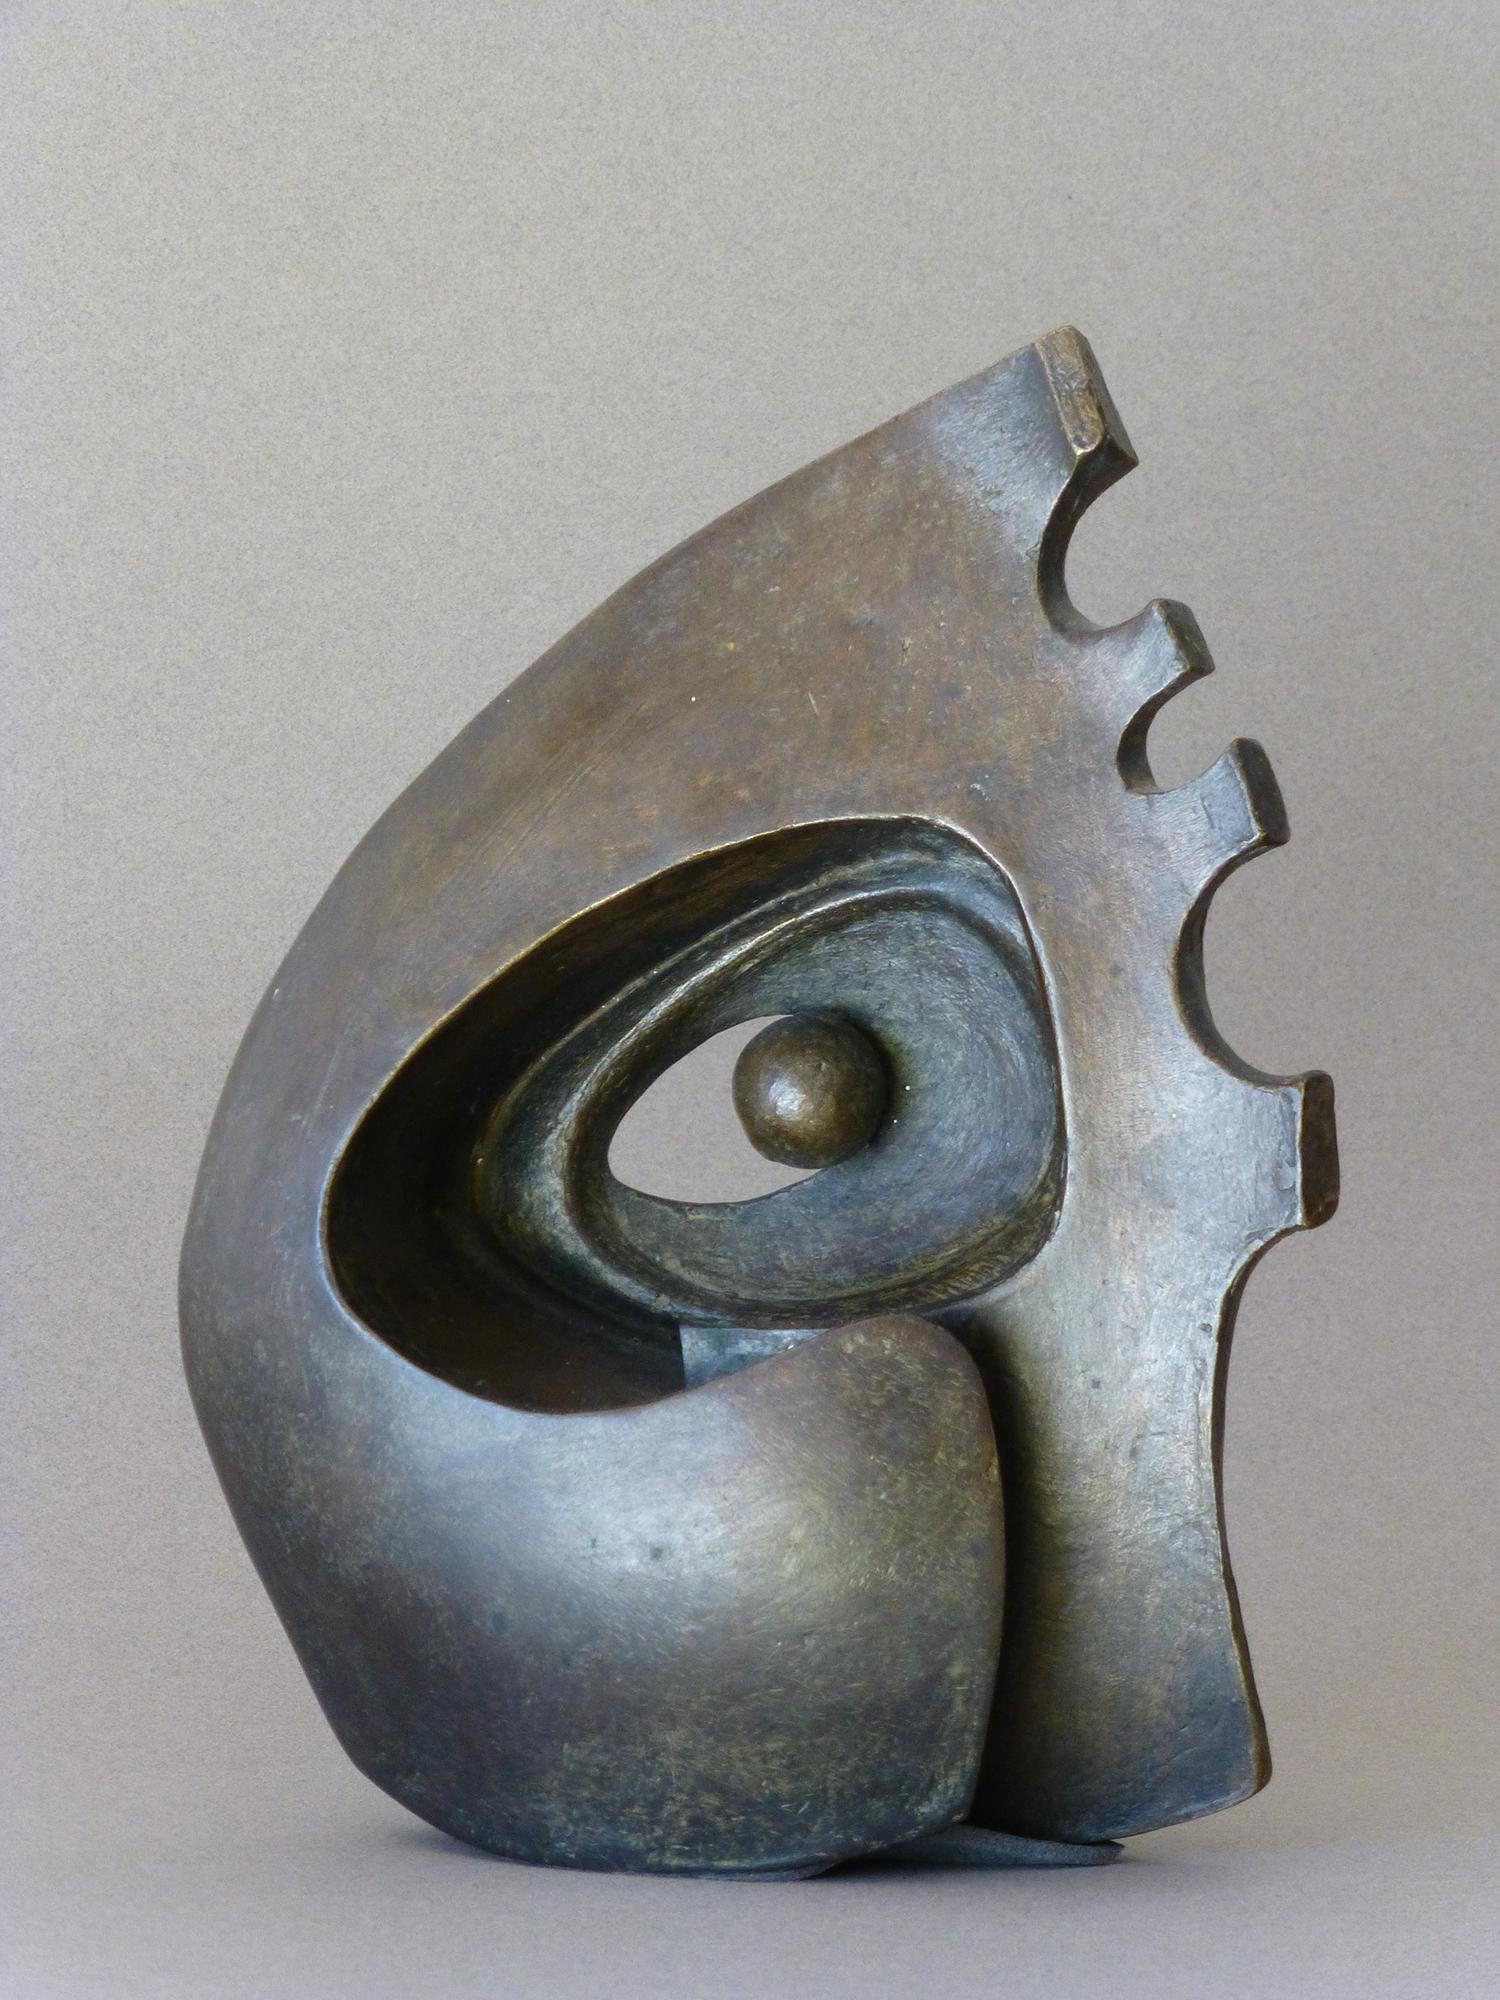 1976.8. Forma con bola, bronce, 25x20x08 cms. 1976